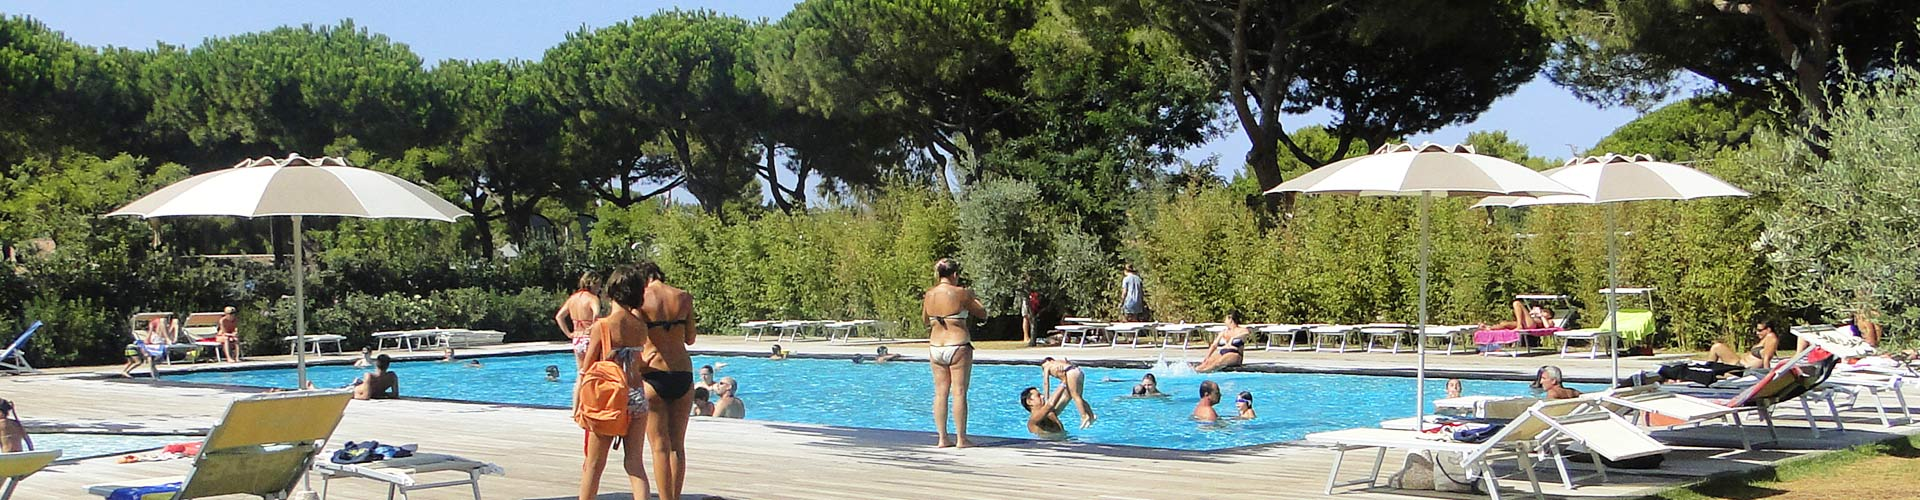 camping sardaigne bord de mer avec piscine